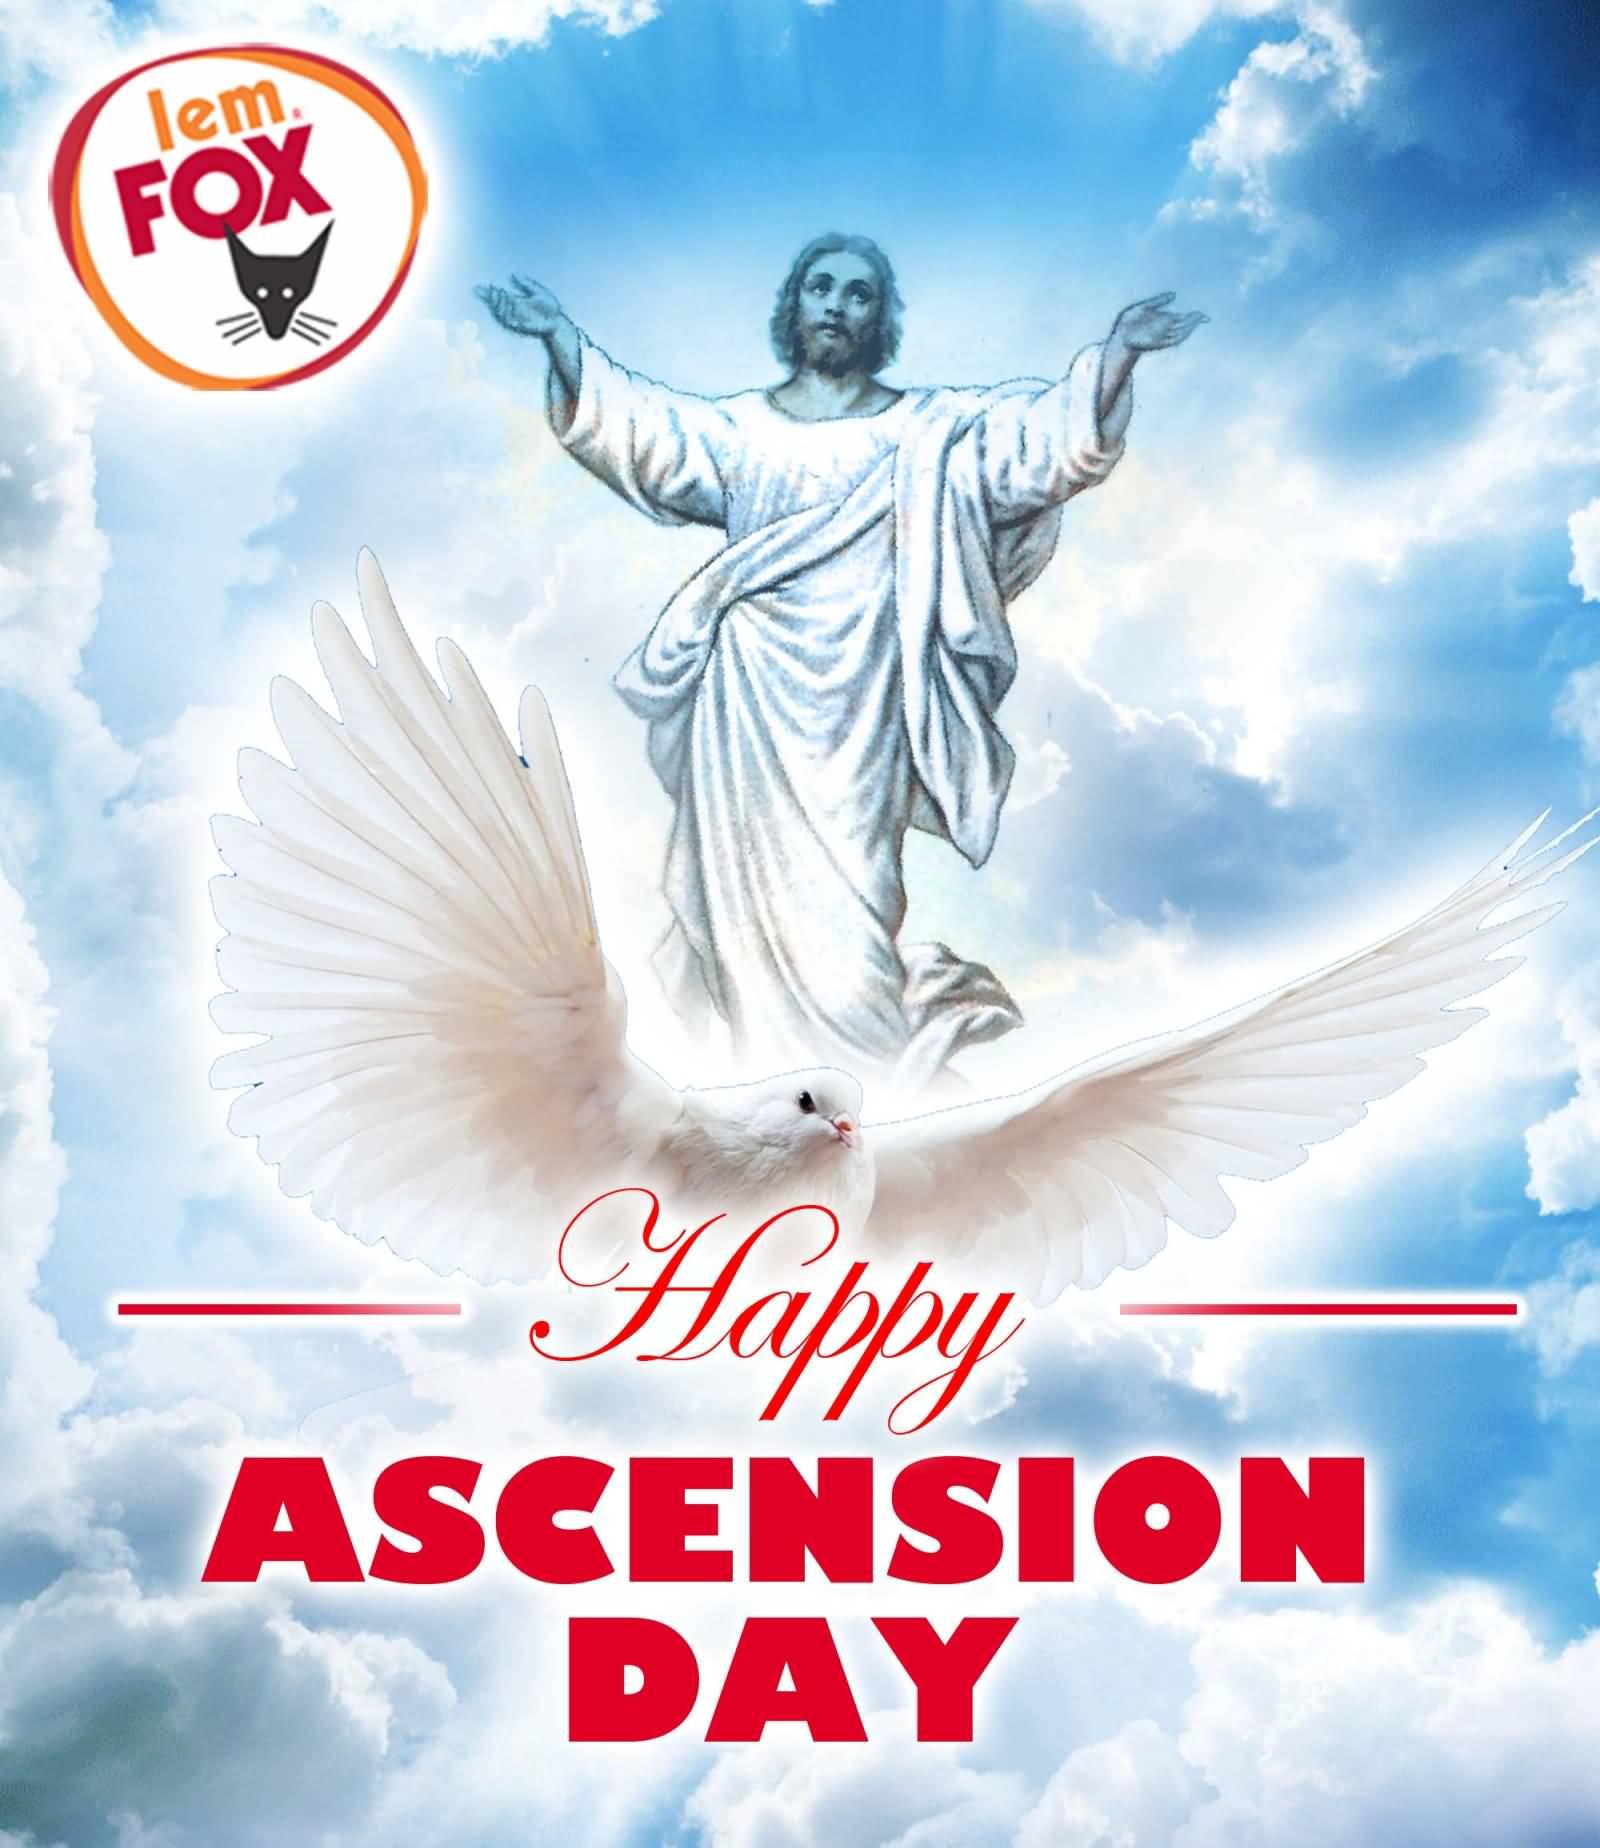 Happy Ascension Day Jesus Christ